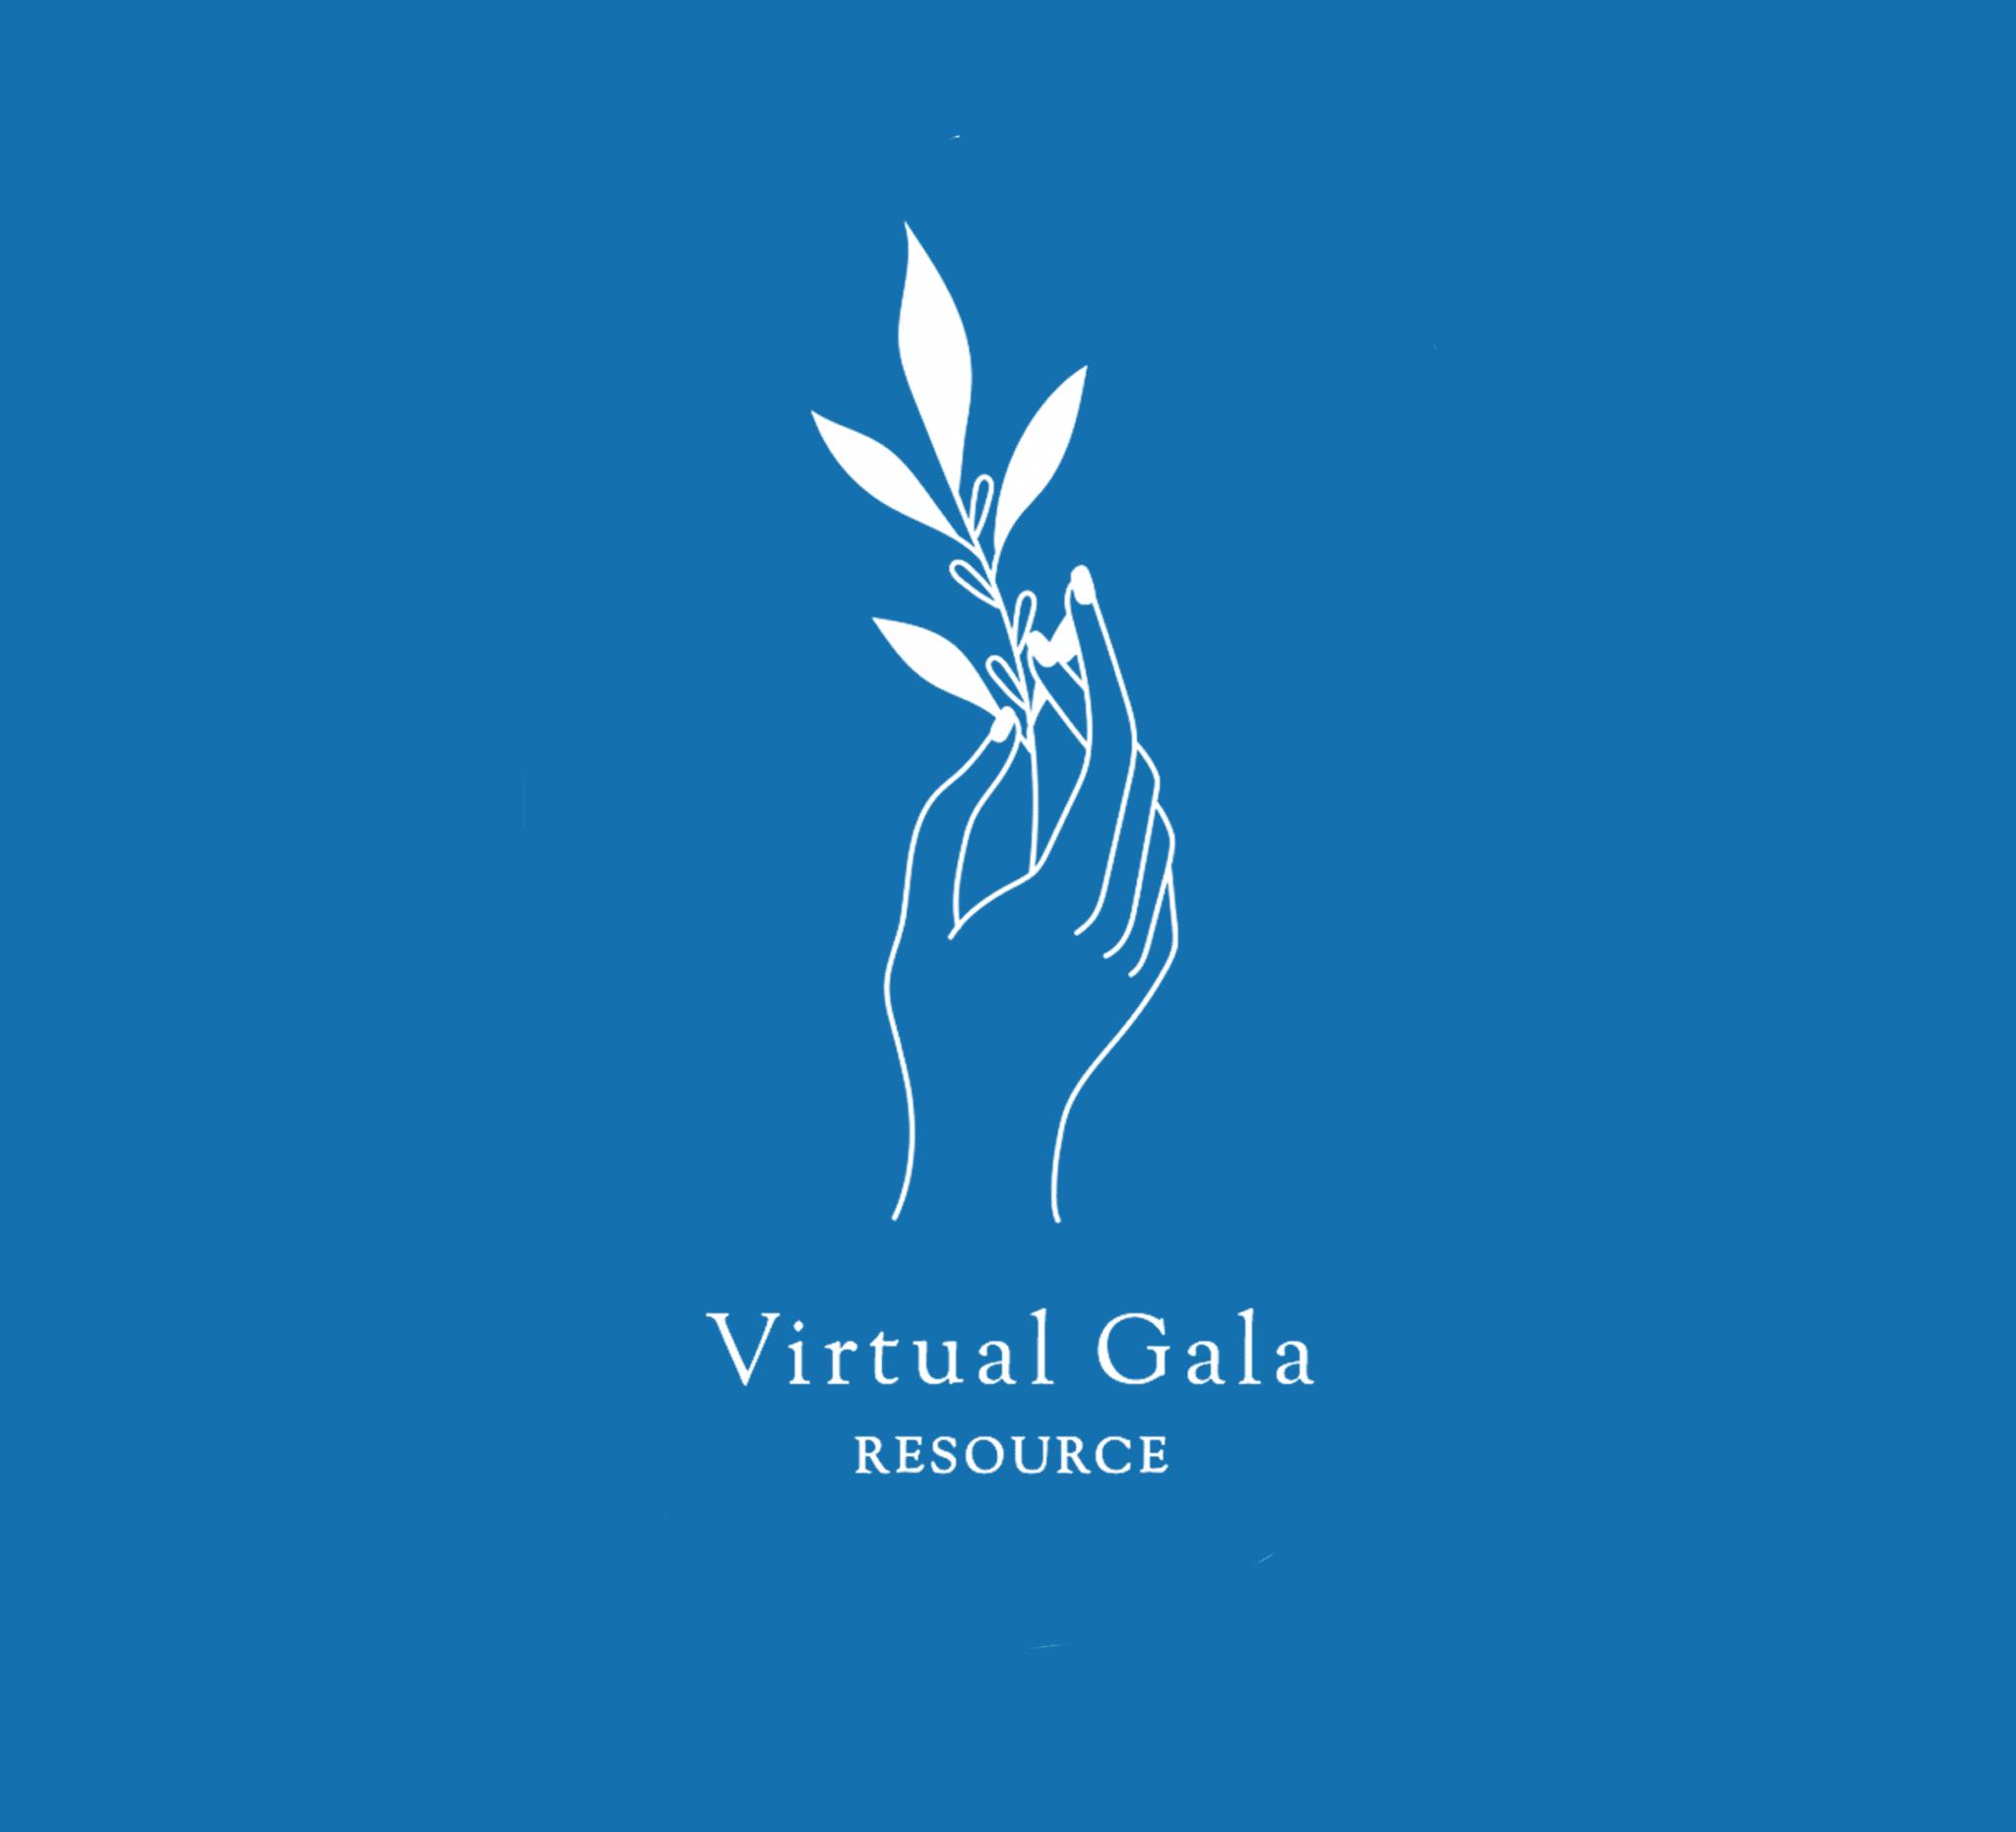 Virtual Gala Resource